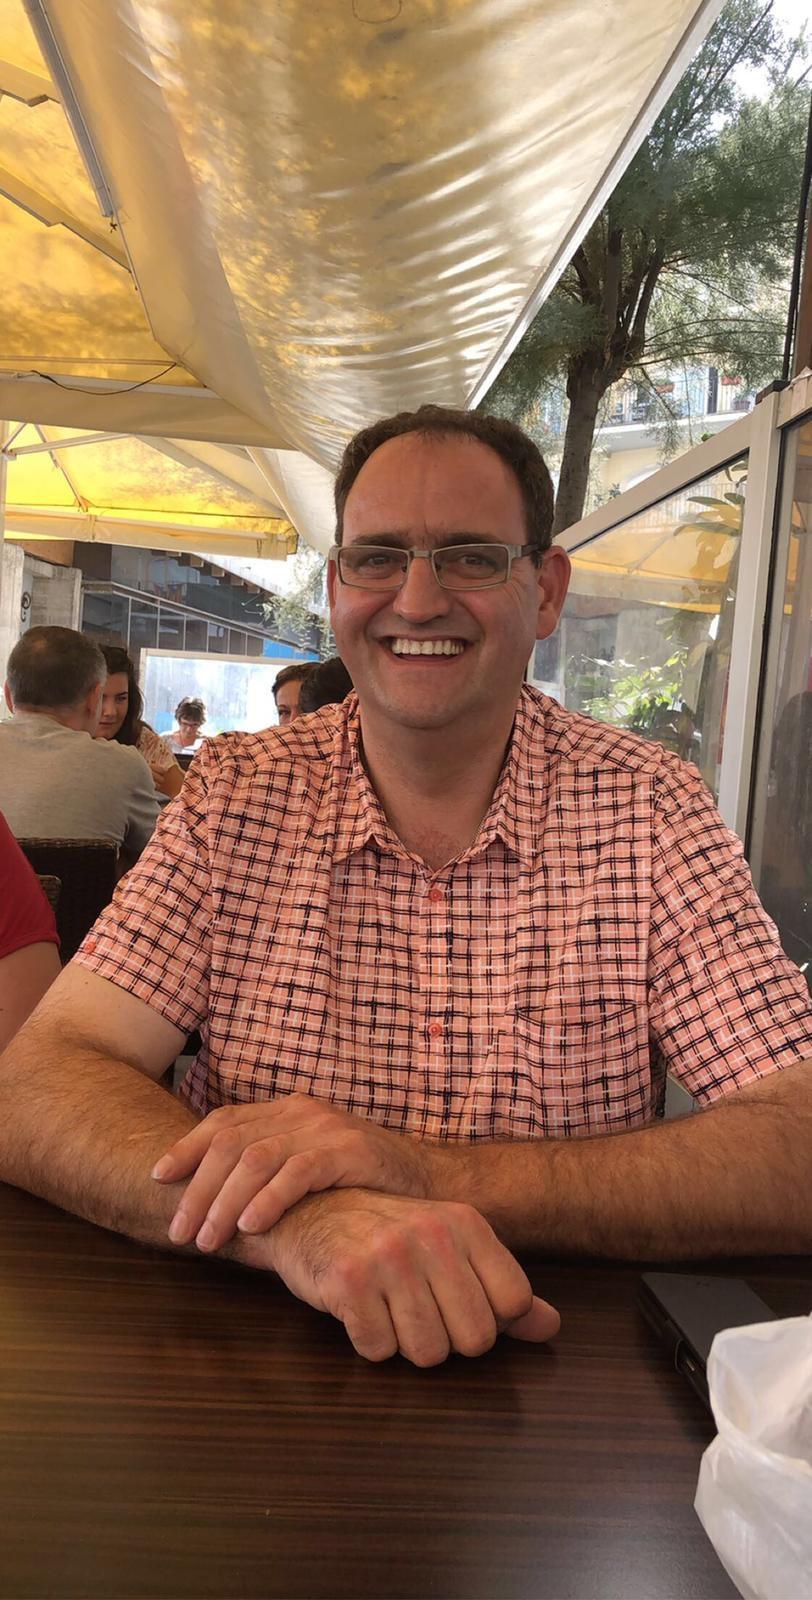 Paul-Klinkenberg-R-I-P-6-6-2021